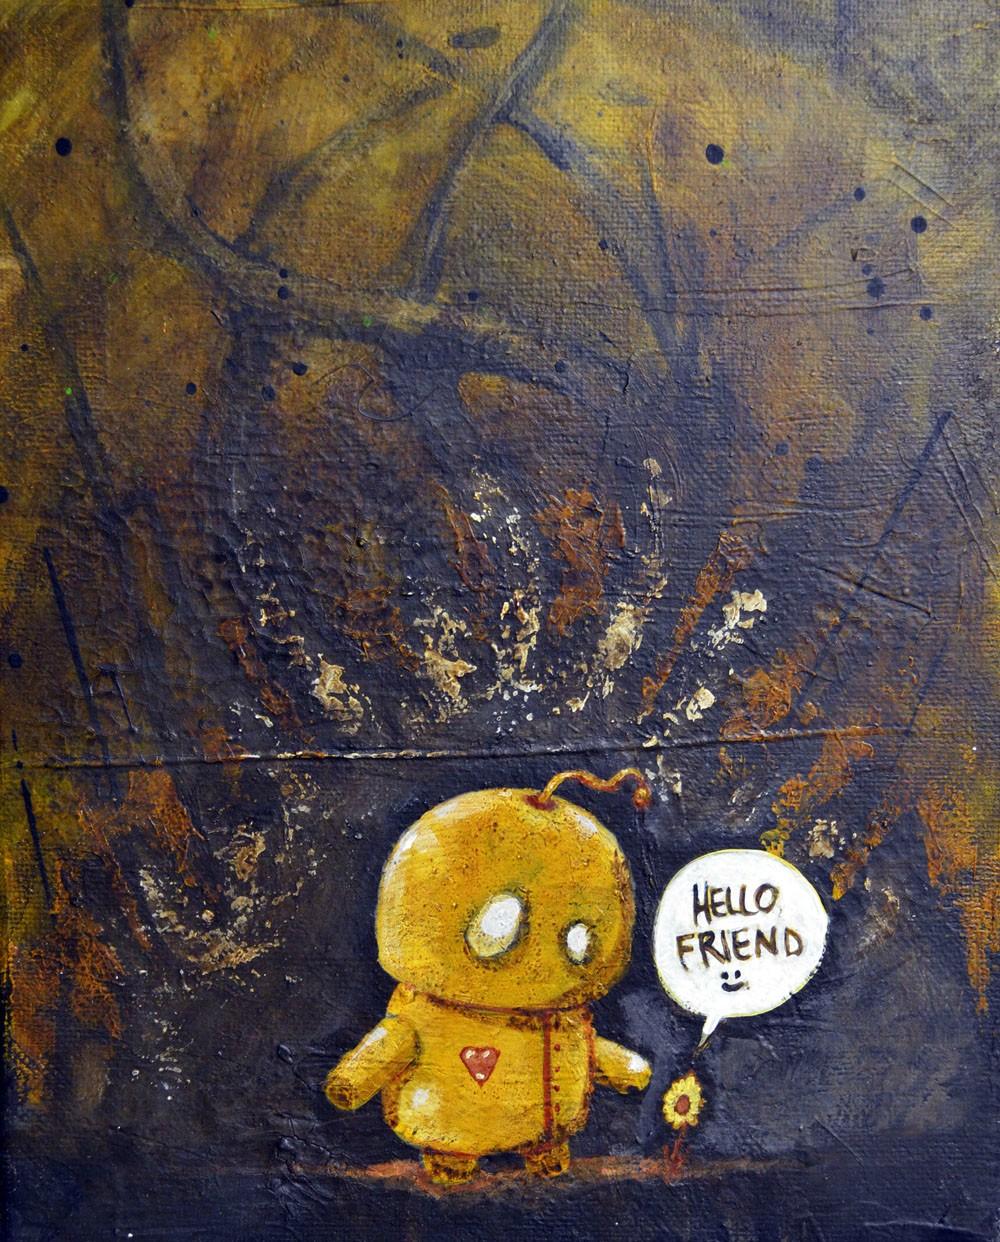 05 - Hello Friend.jpg